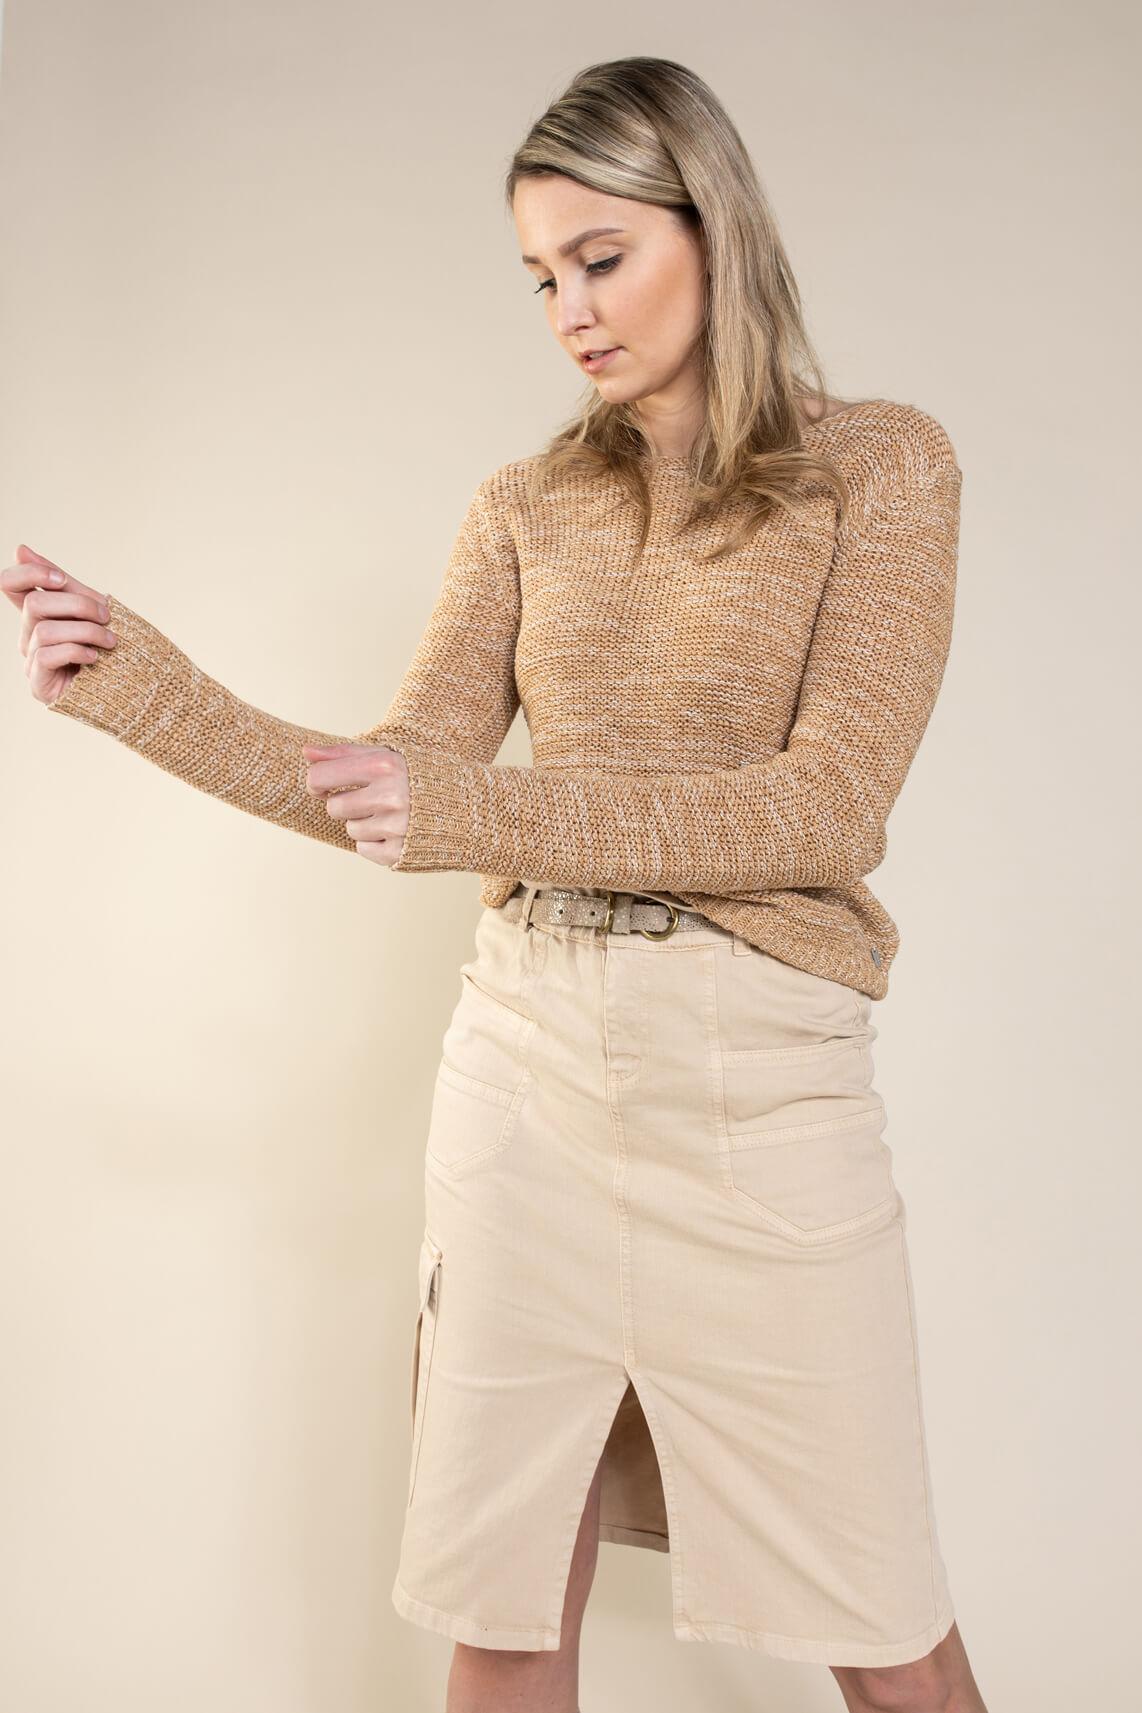 Anna Dames Pullover in bandgaren Bruin